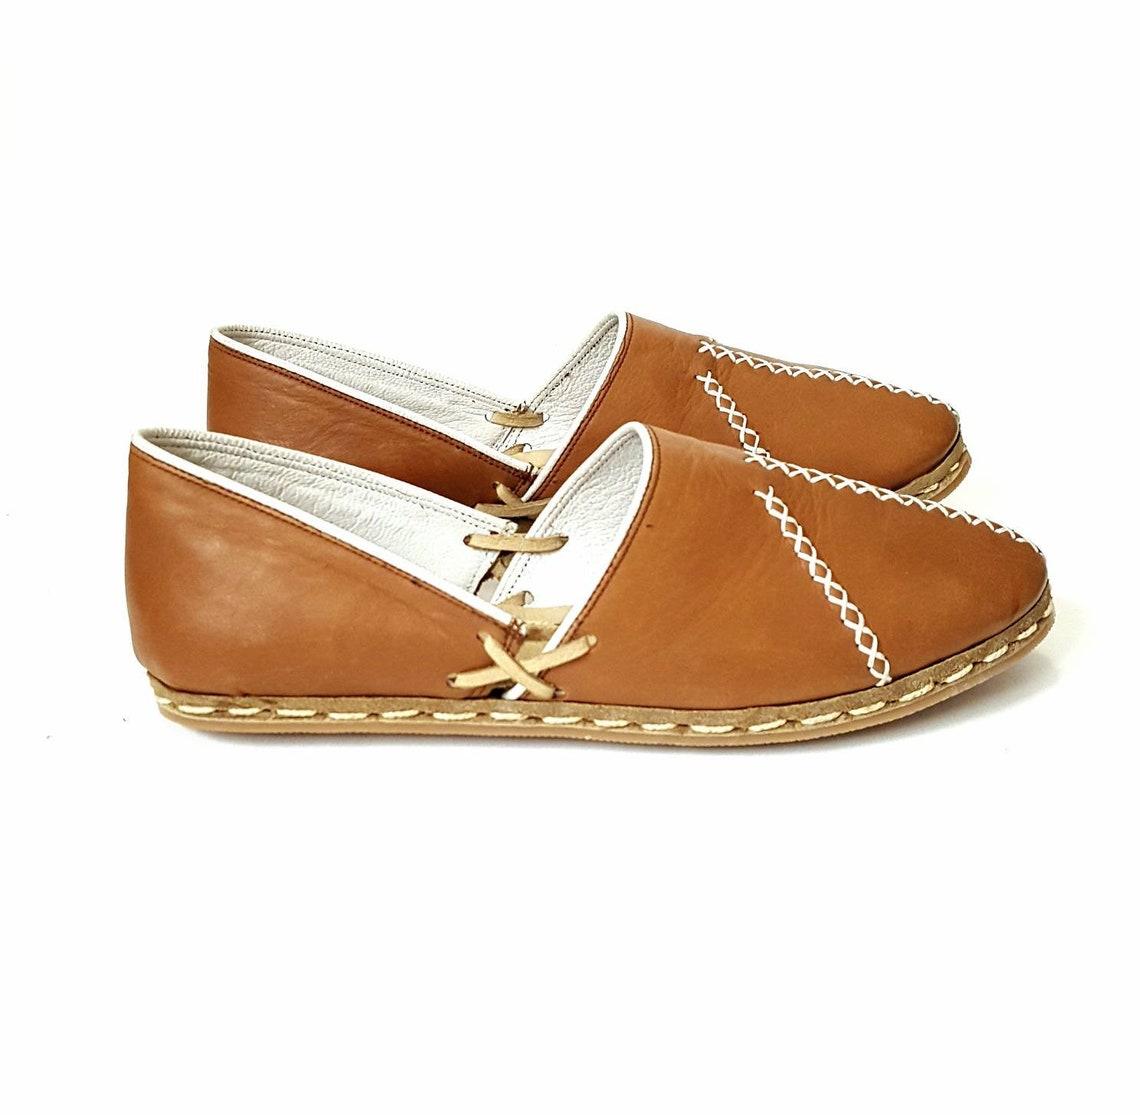 In Stock Handmade Tobacco  Organic Dye 100% Leather Flat Slip Ons Women Loafers Classic Lu Earthing Grounding Shoes